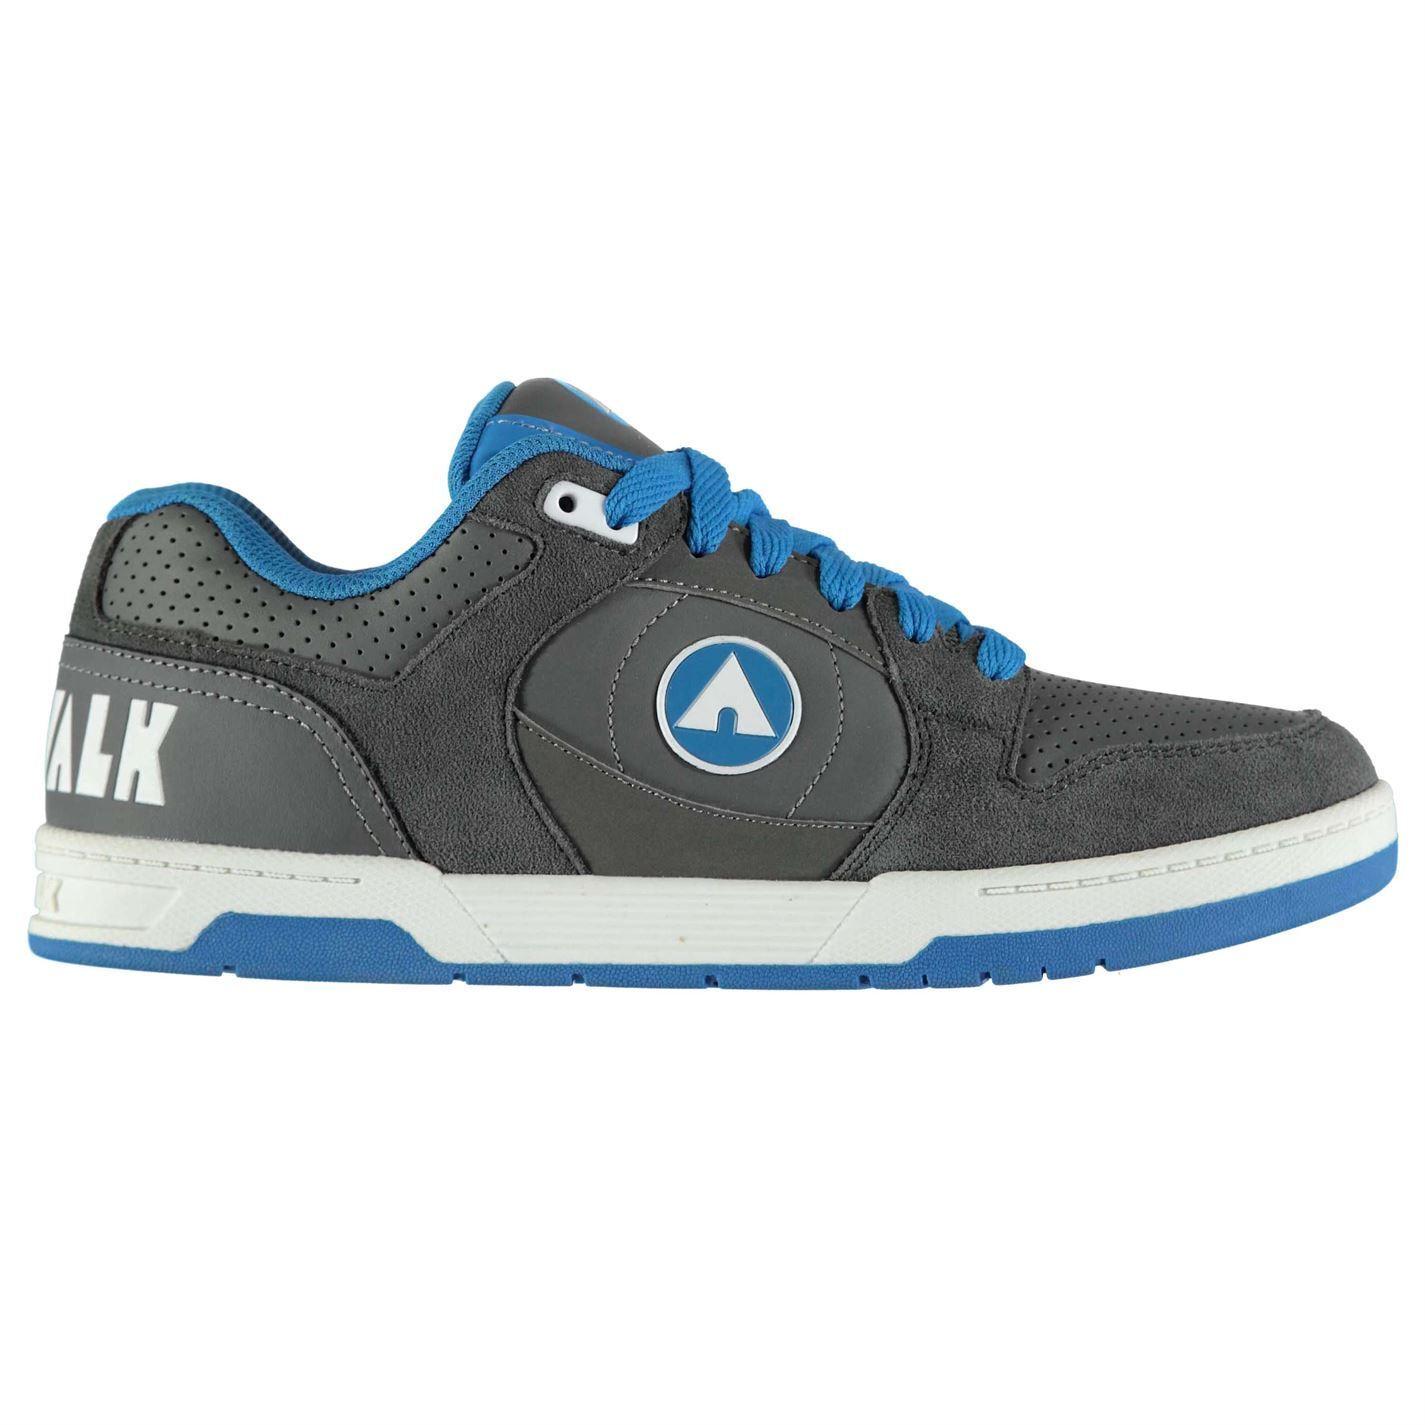 Airwalk Gents Mens Neptu Throttle Shoes Laced Skate Sports Sneaker Trainers 7-13